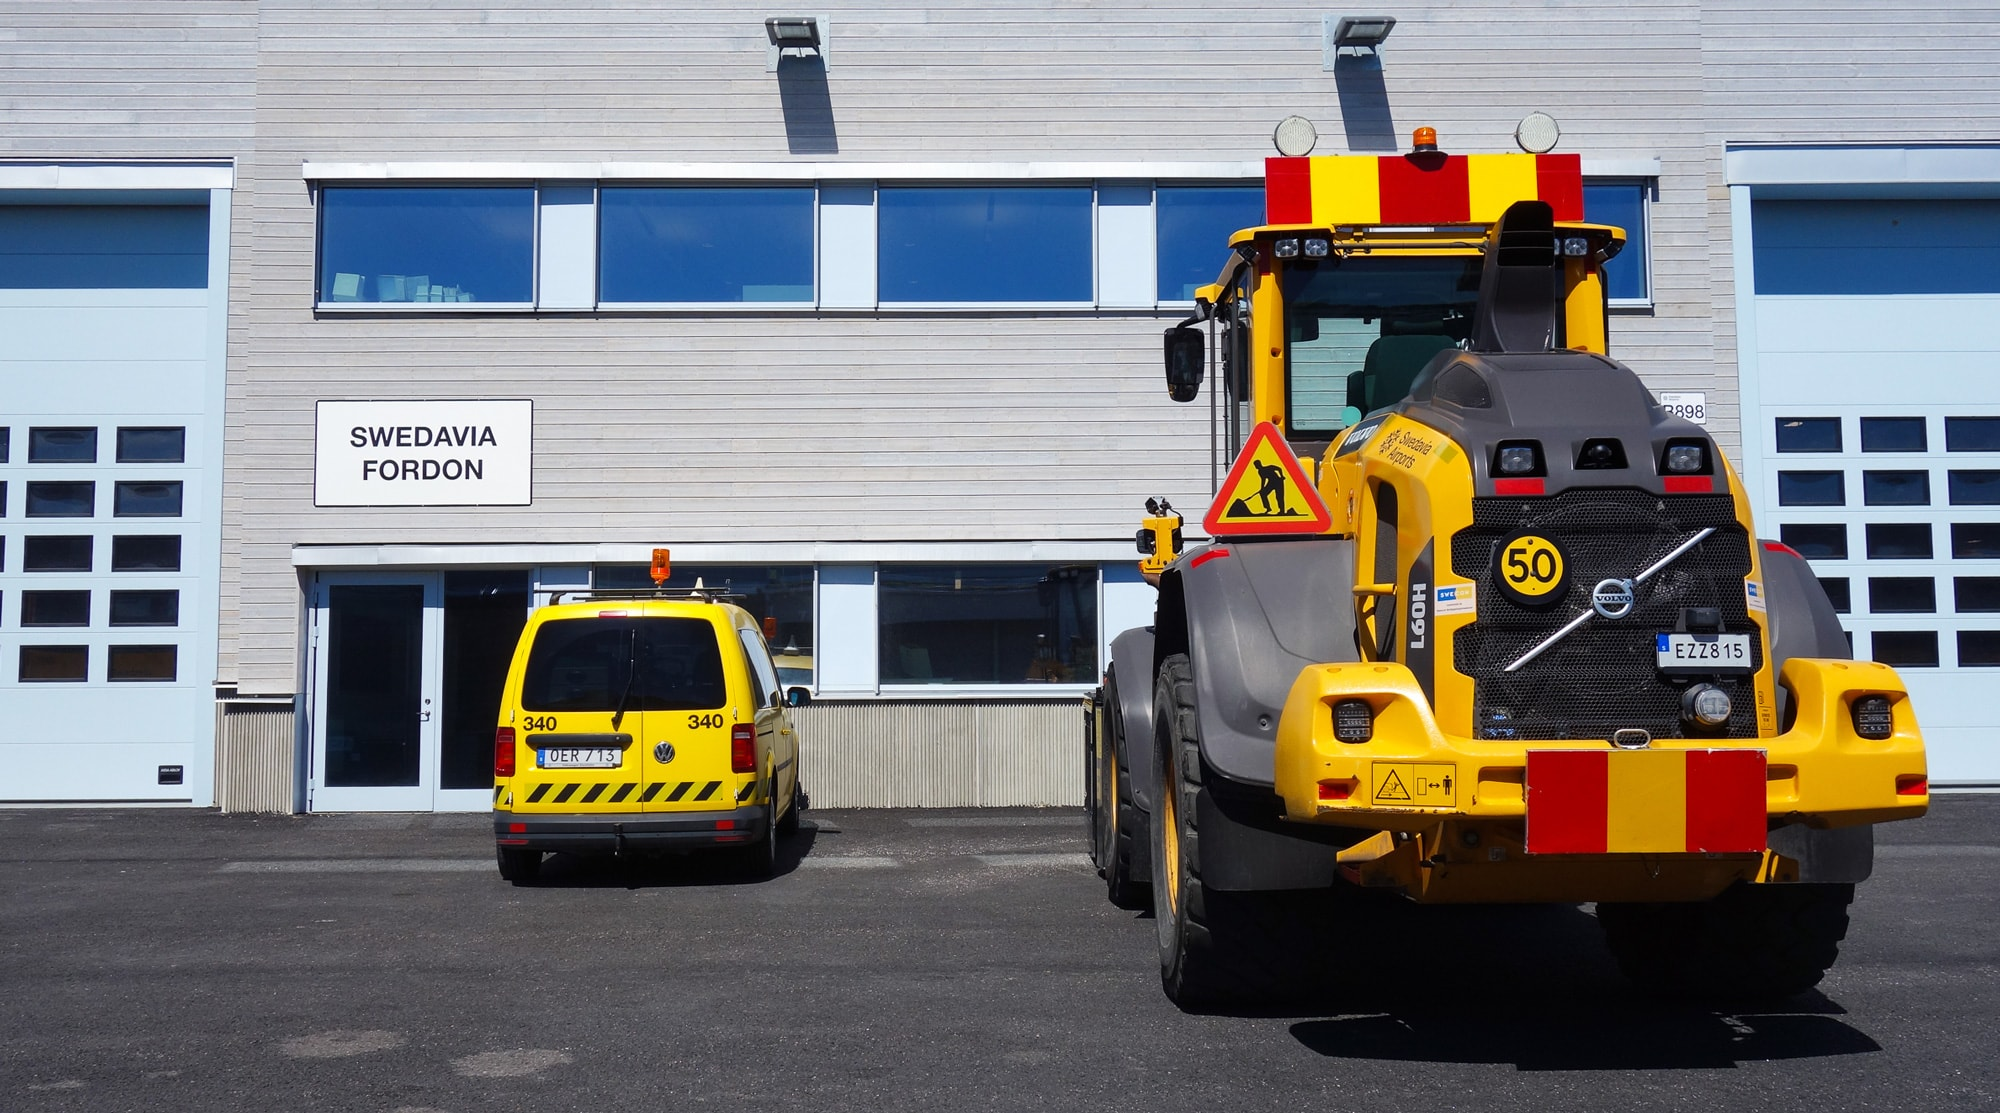 Bil och maskin hos Swedavia Fordon